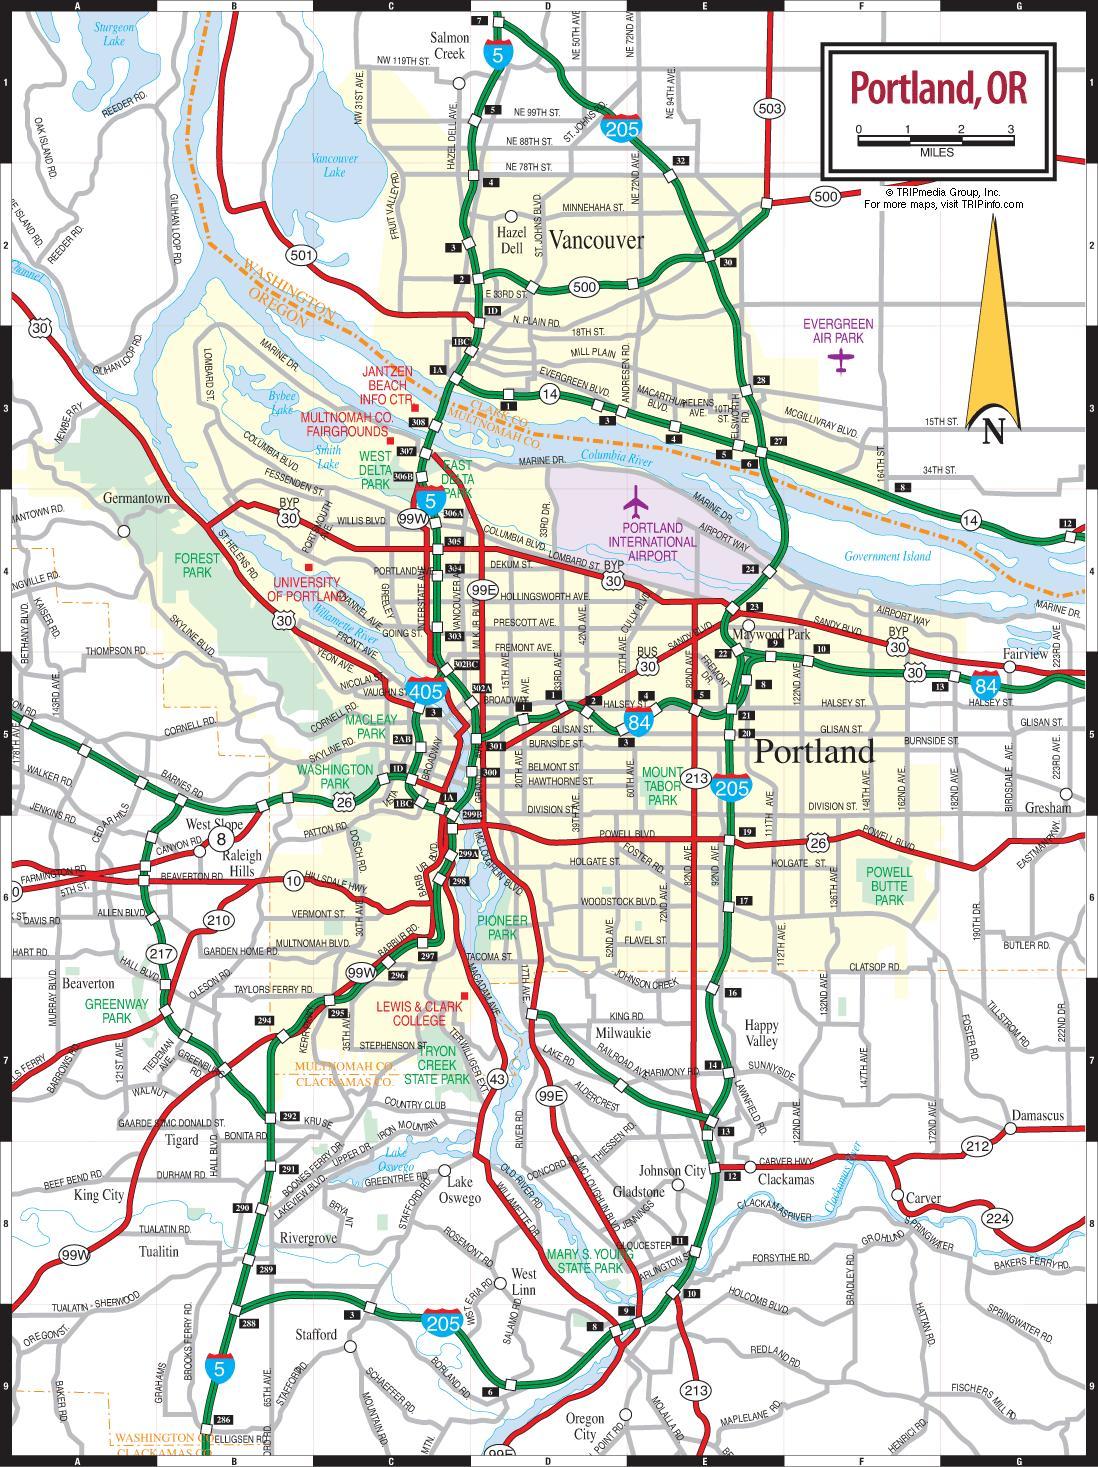 Portland, Oregon map - Karte von Portland, Oregon (Oregon - USA)